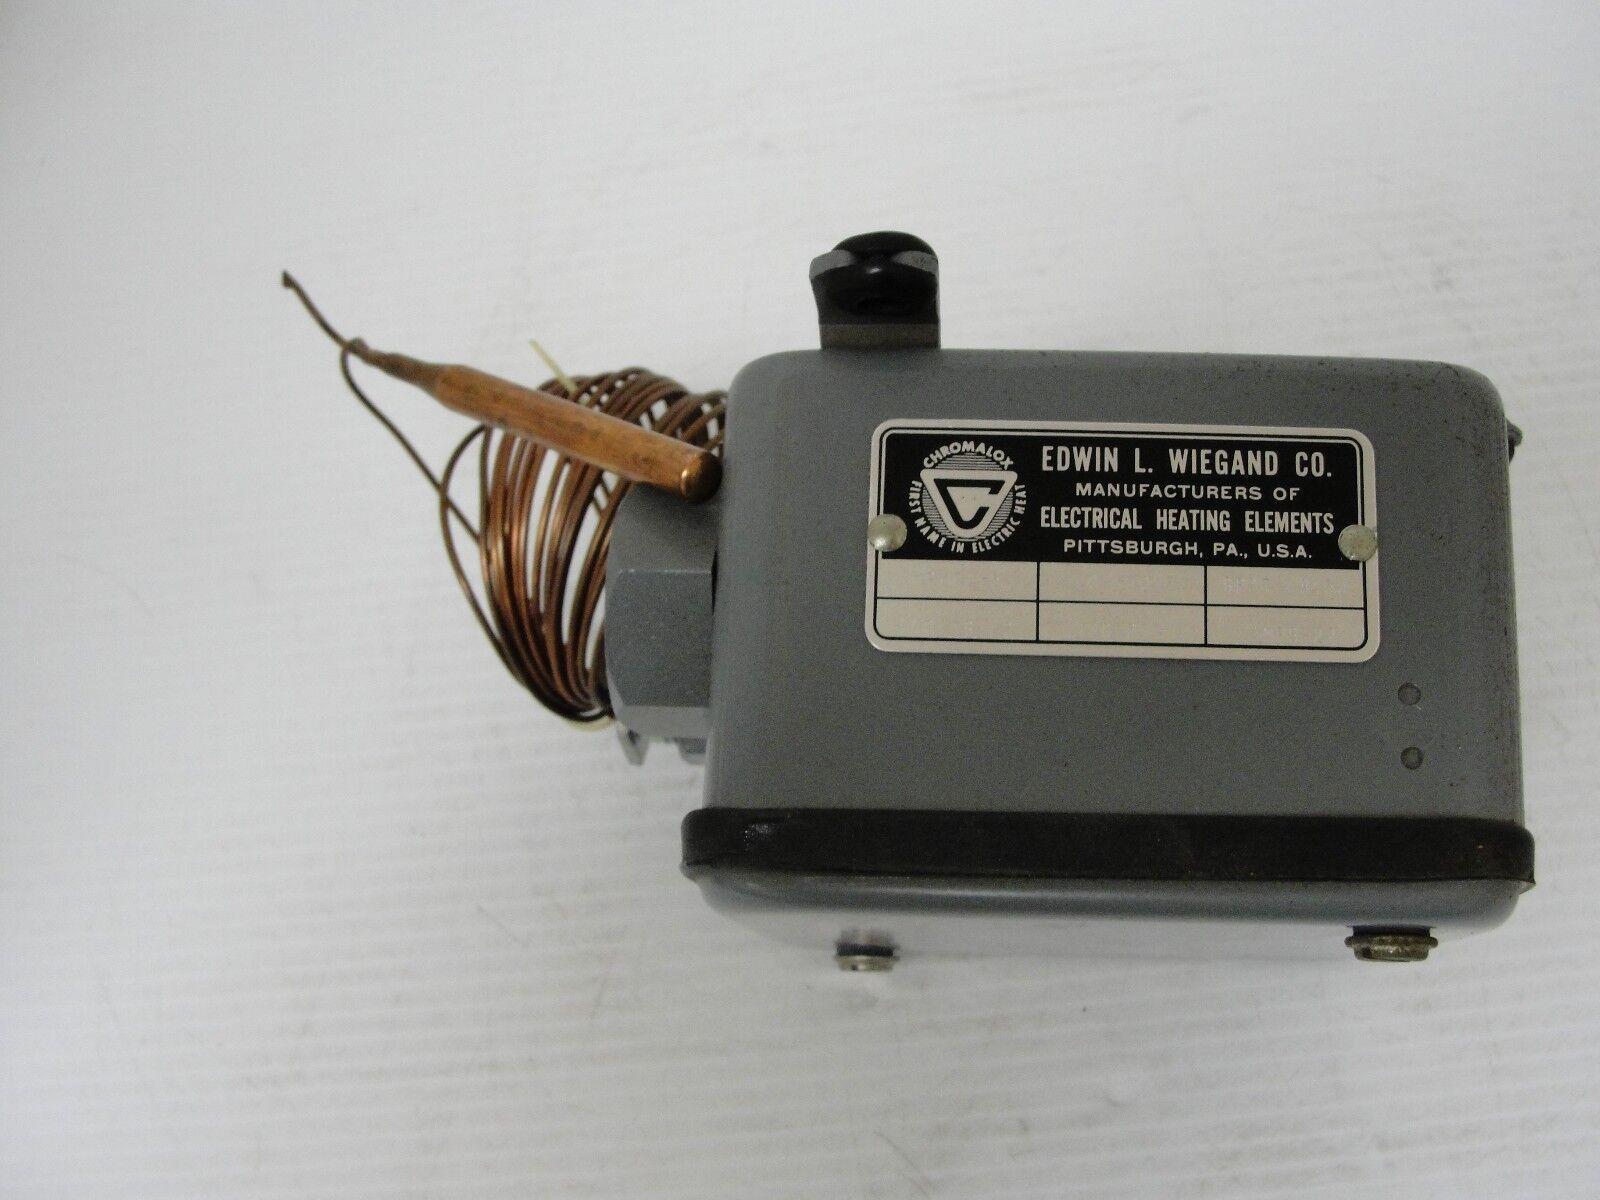 , Chromalox/Wiegand, Industrial Thermostat, PK4248-3, 3001A, 0-150F, SPDT 8450